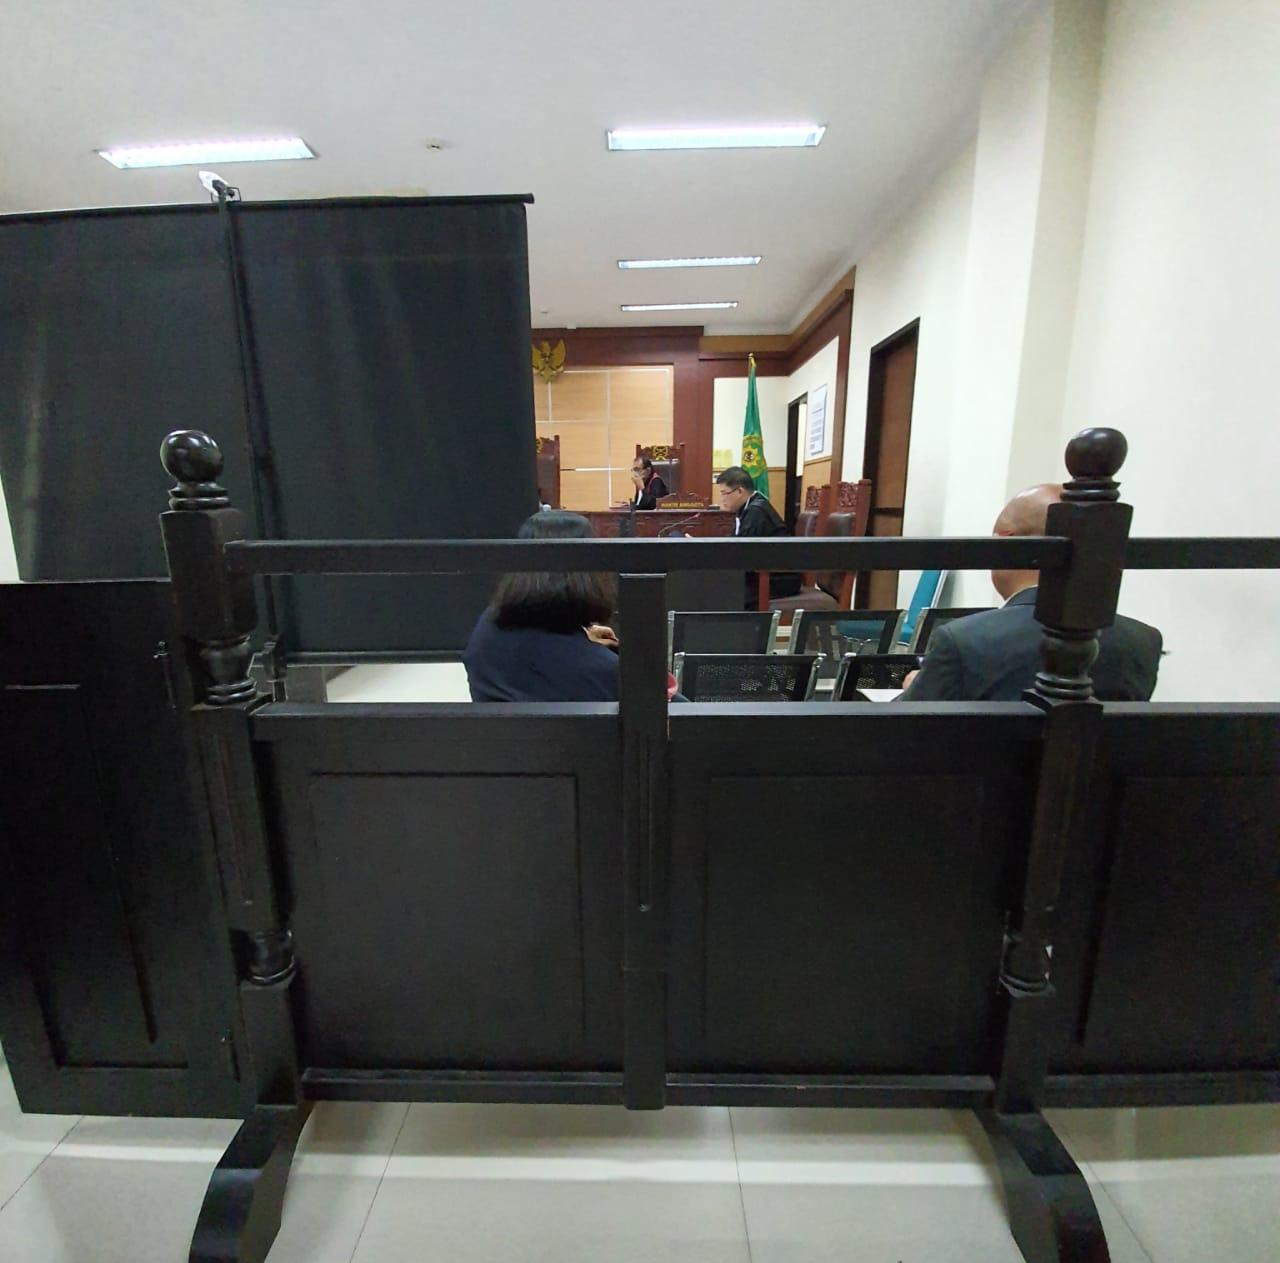 Hakim Lanjutkan Sidang Online Saat Terdakwa Sakit, Kuasa Hukum Ancam Lapor KY